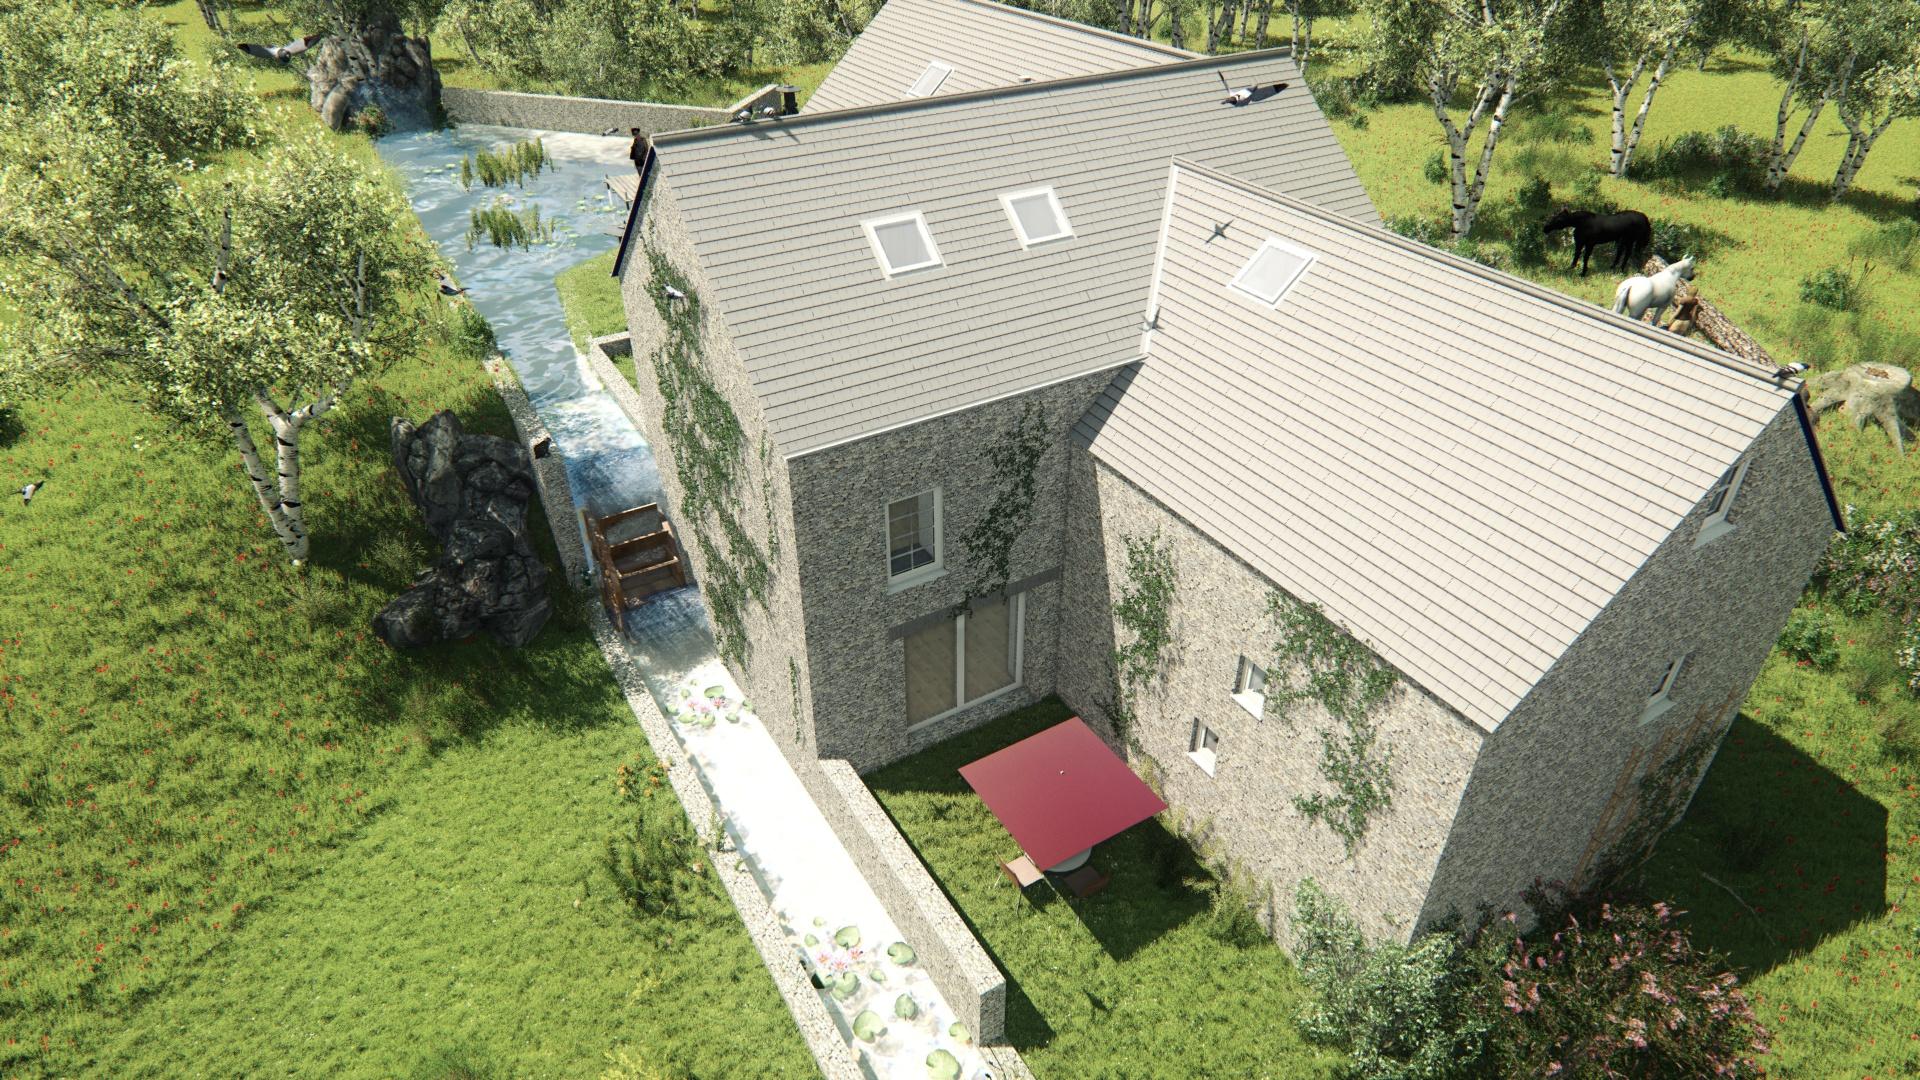 Home improver or renovator